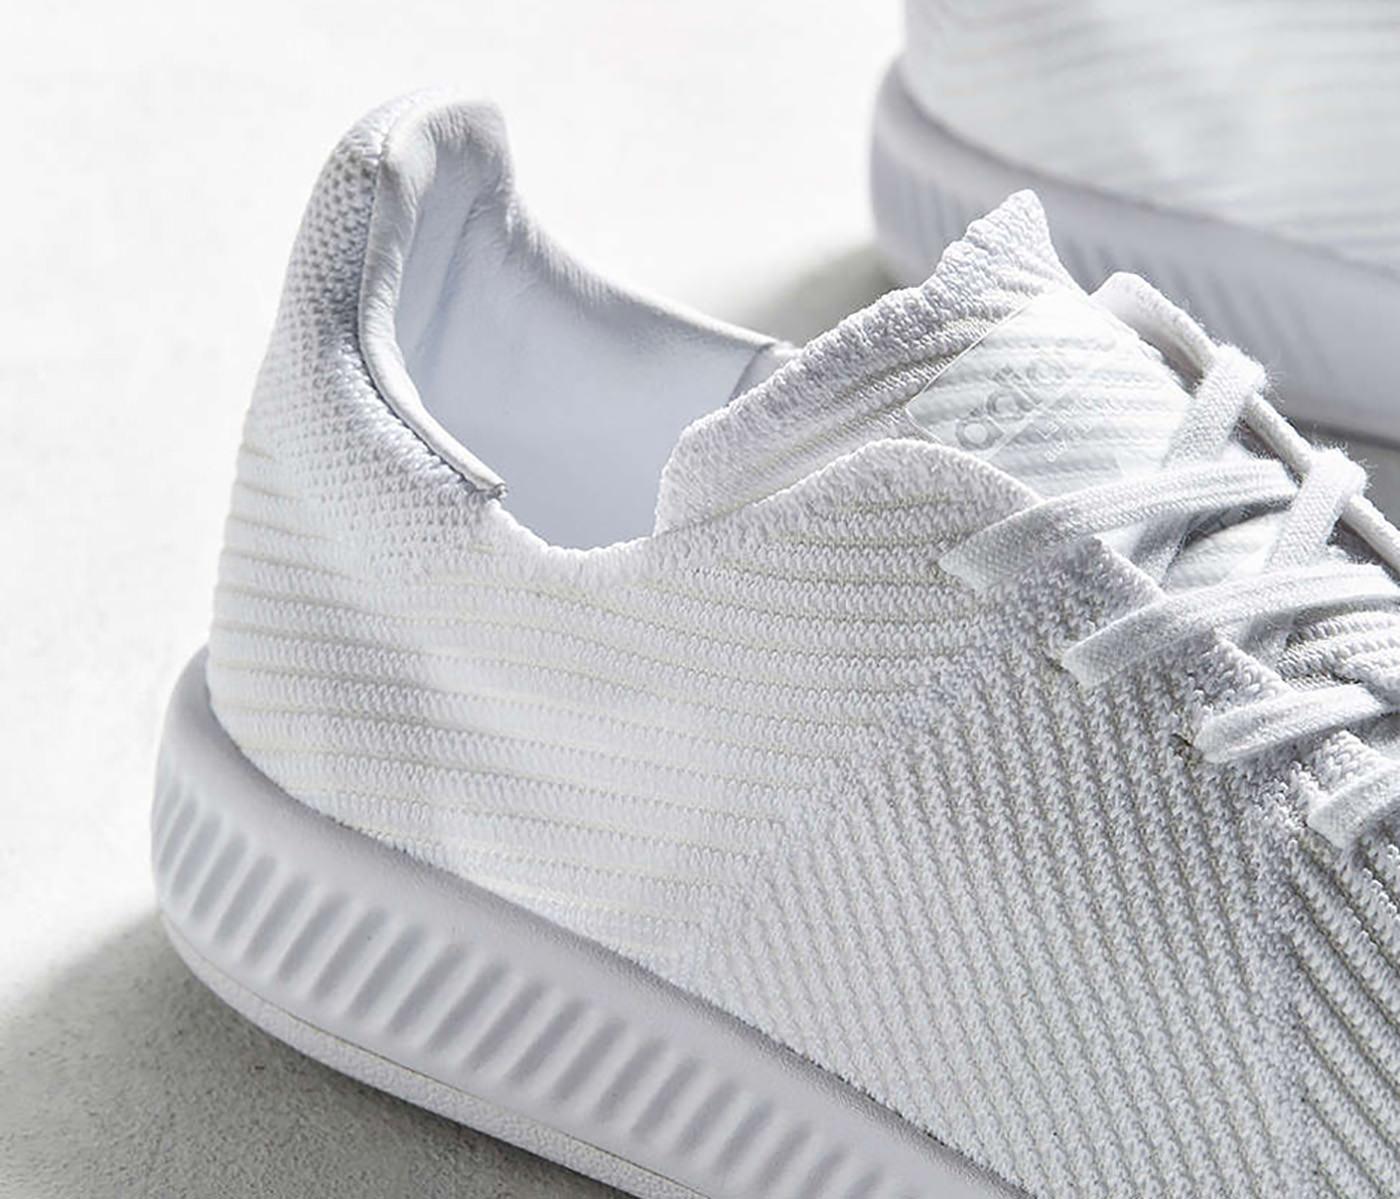 adidas-superstar-primeknit-4